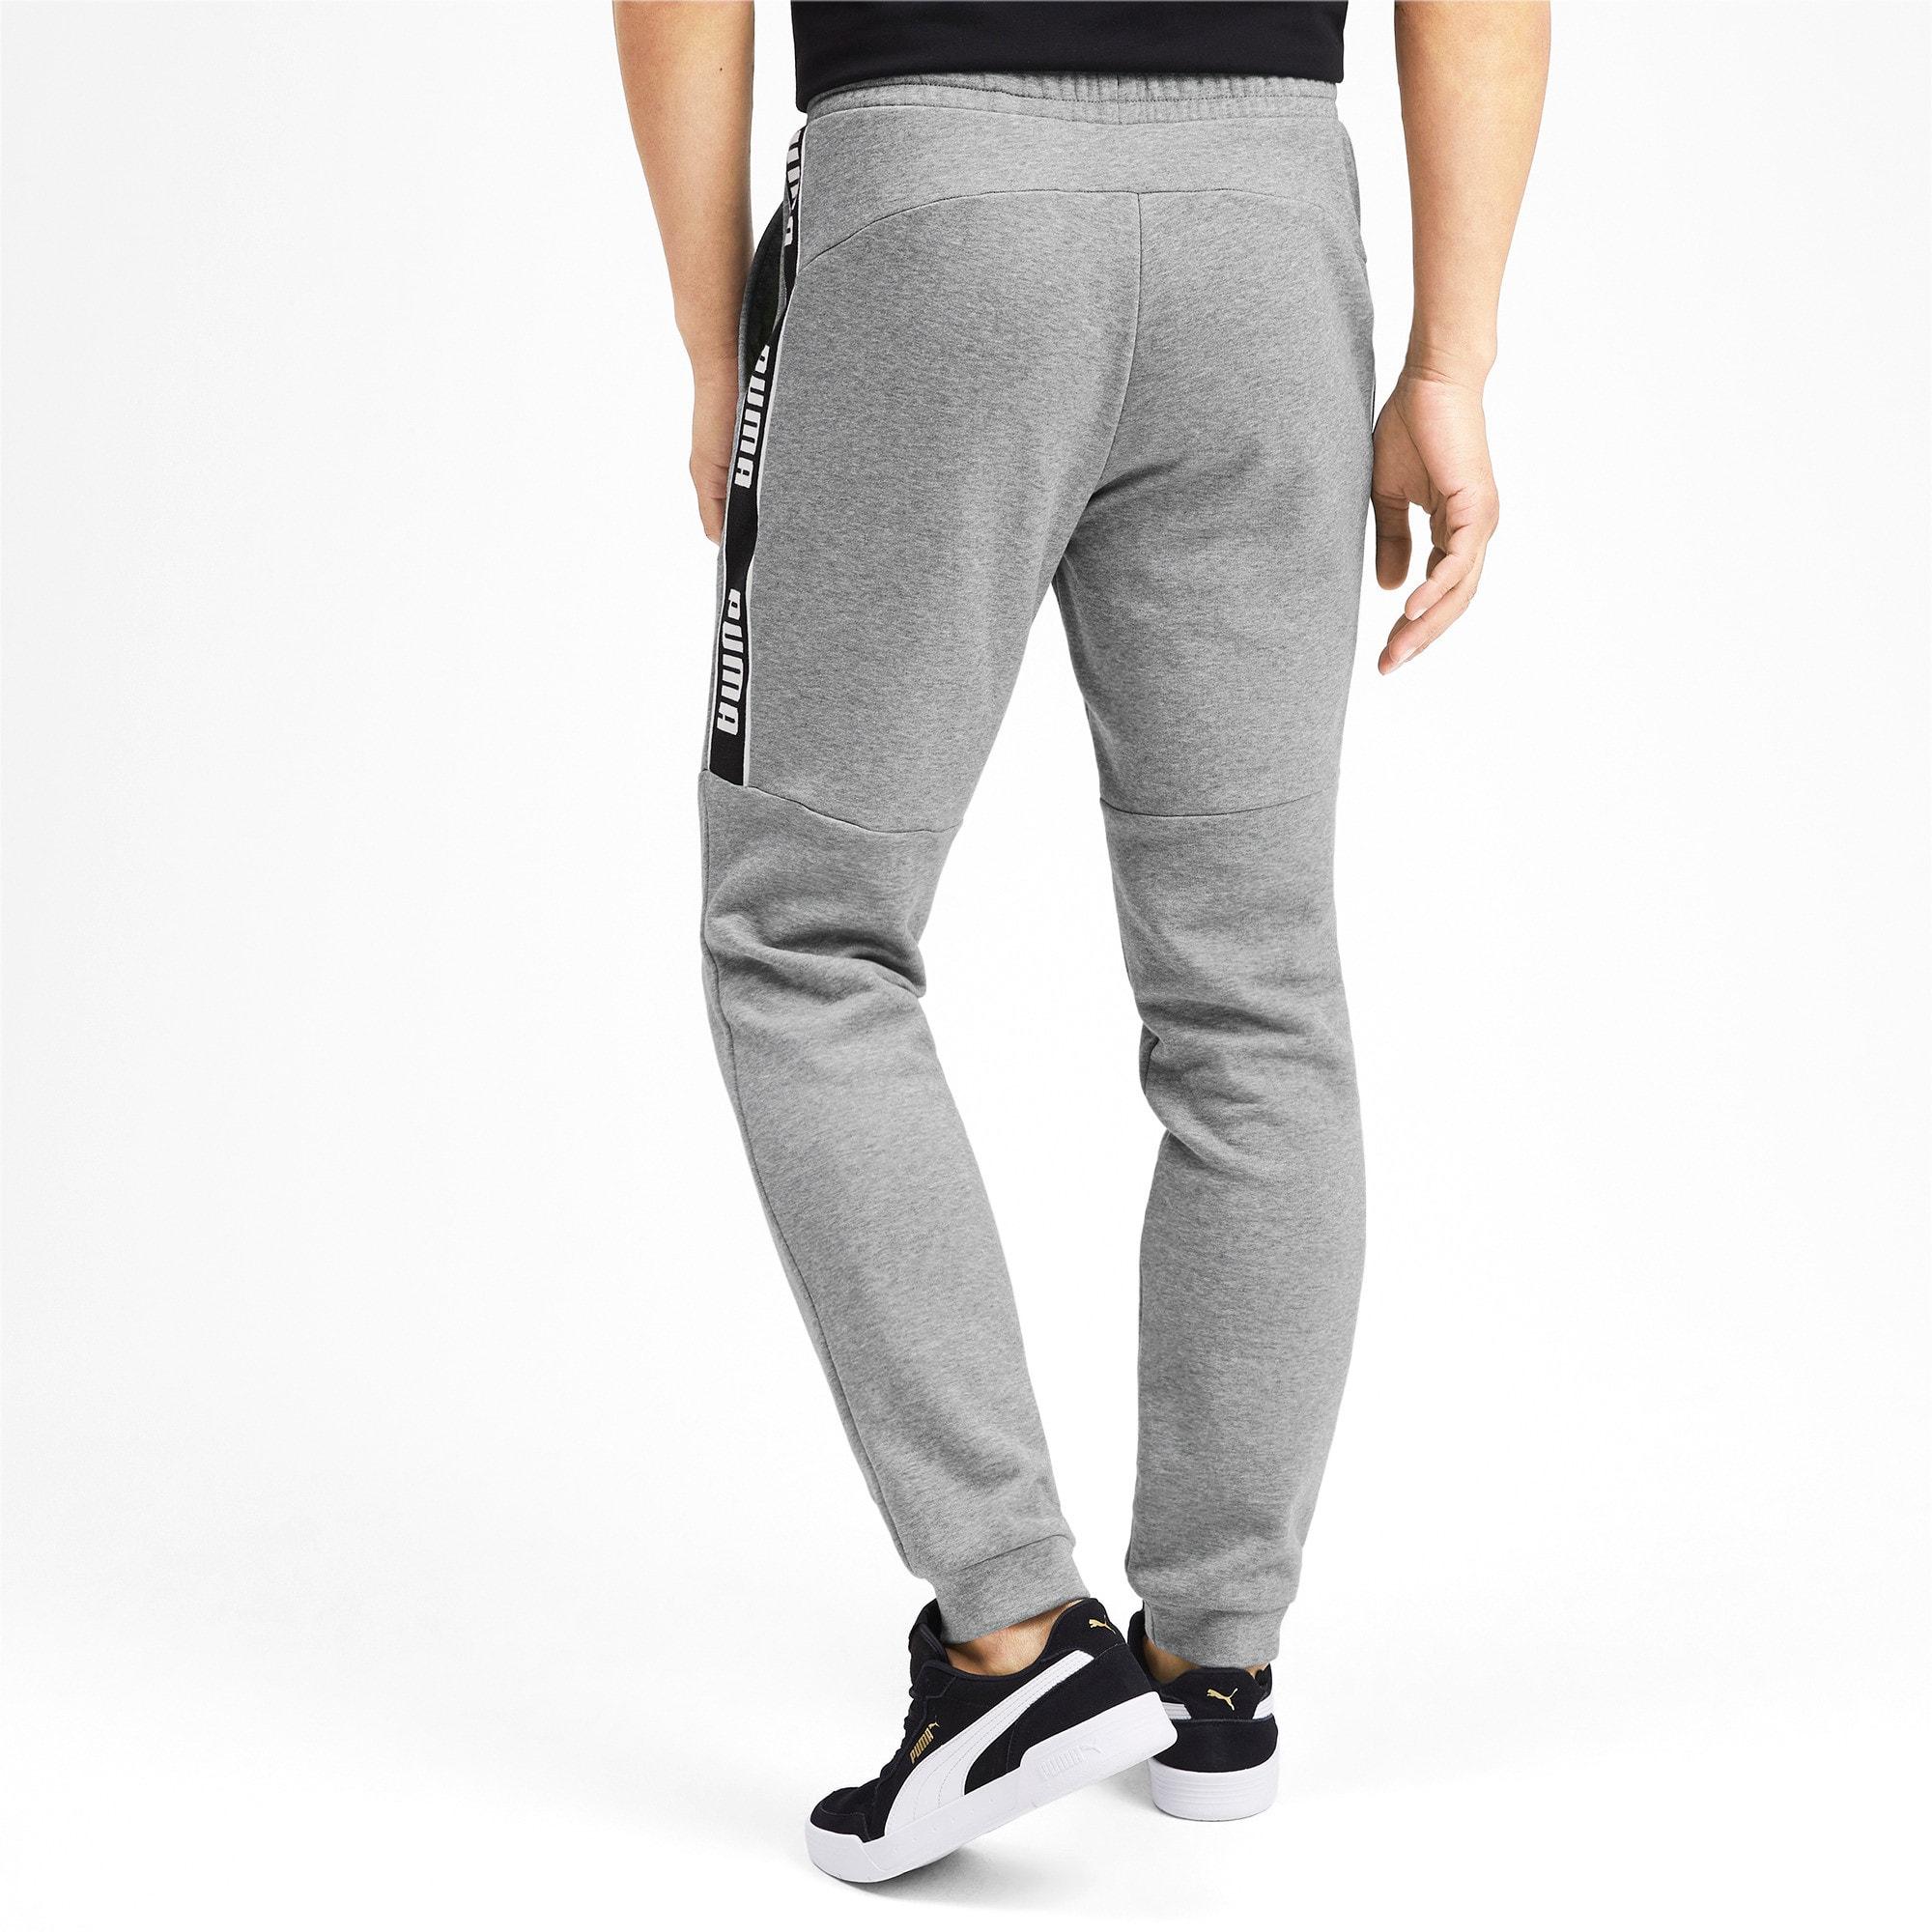 Thumbnail 2 of Amplified Men's Sweatpants, Medium Gray Heather, medium